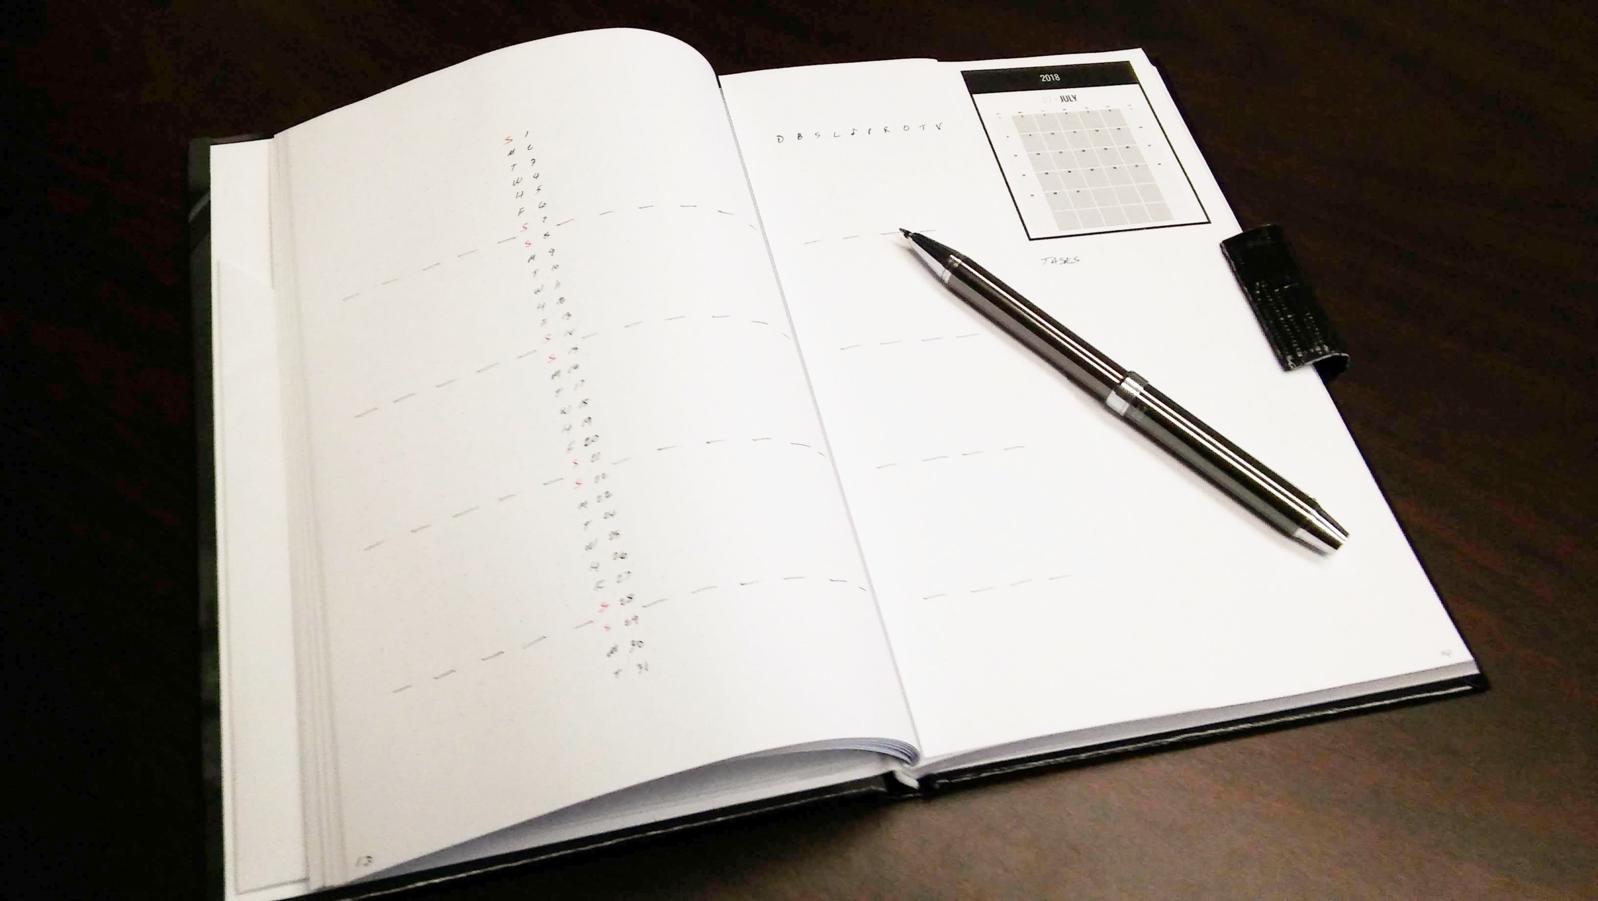 Картинки по запросу картинки журнал и ручка